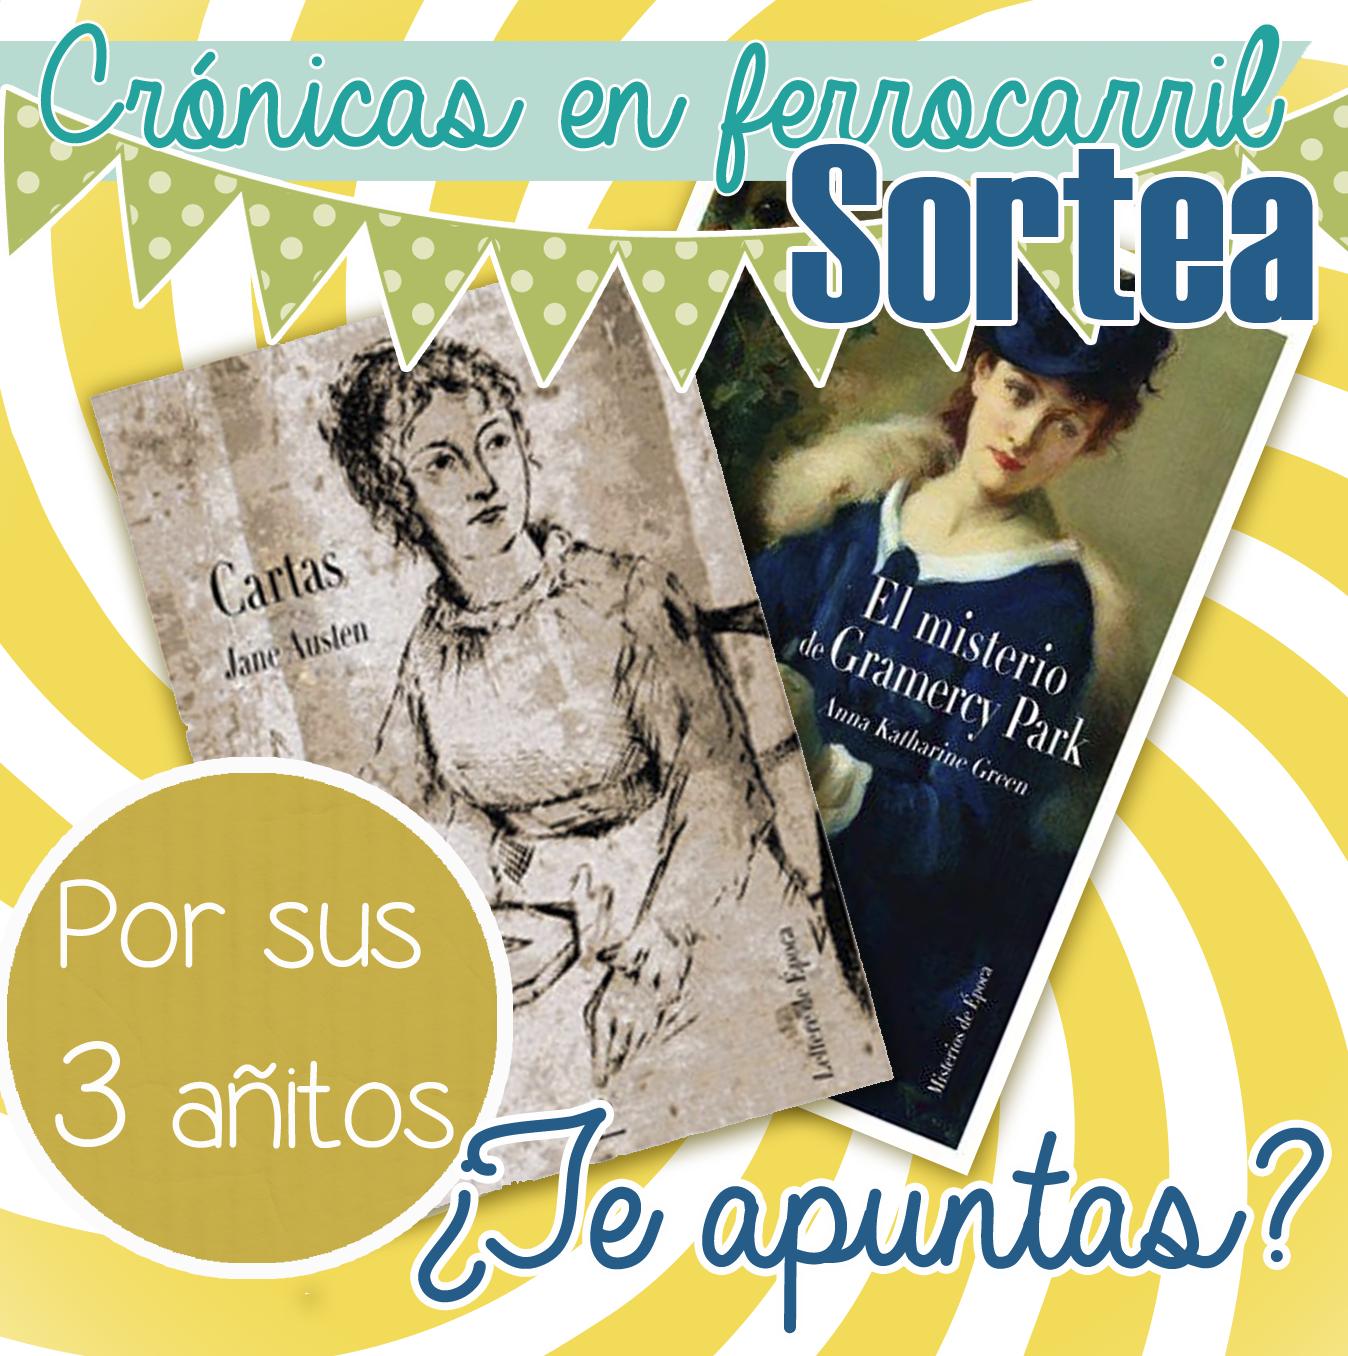 http://cronicasenferrocarril.blogspot.com.es/2014/11/tercer-aniversario-con-sorteo-incluido.html